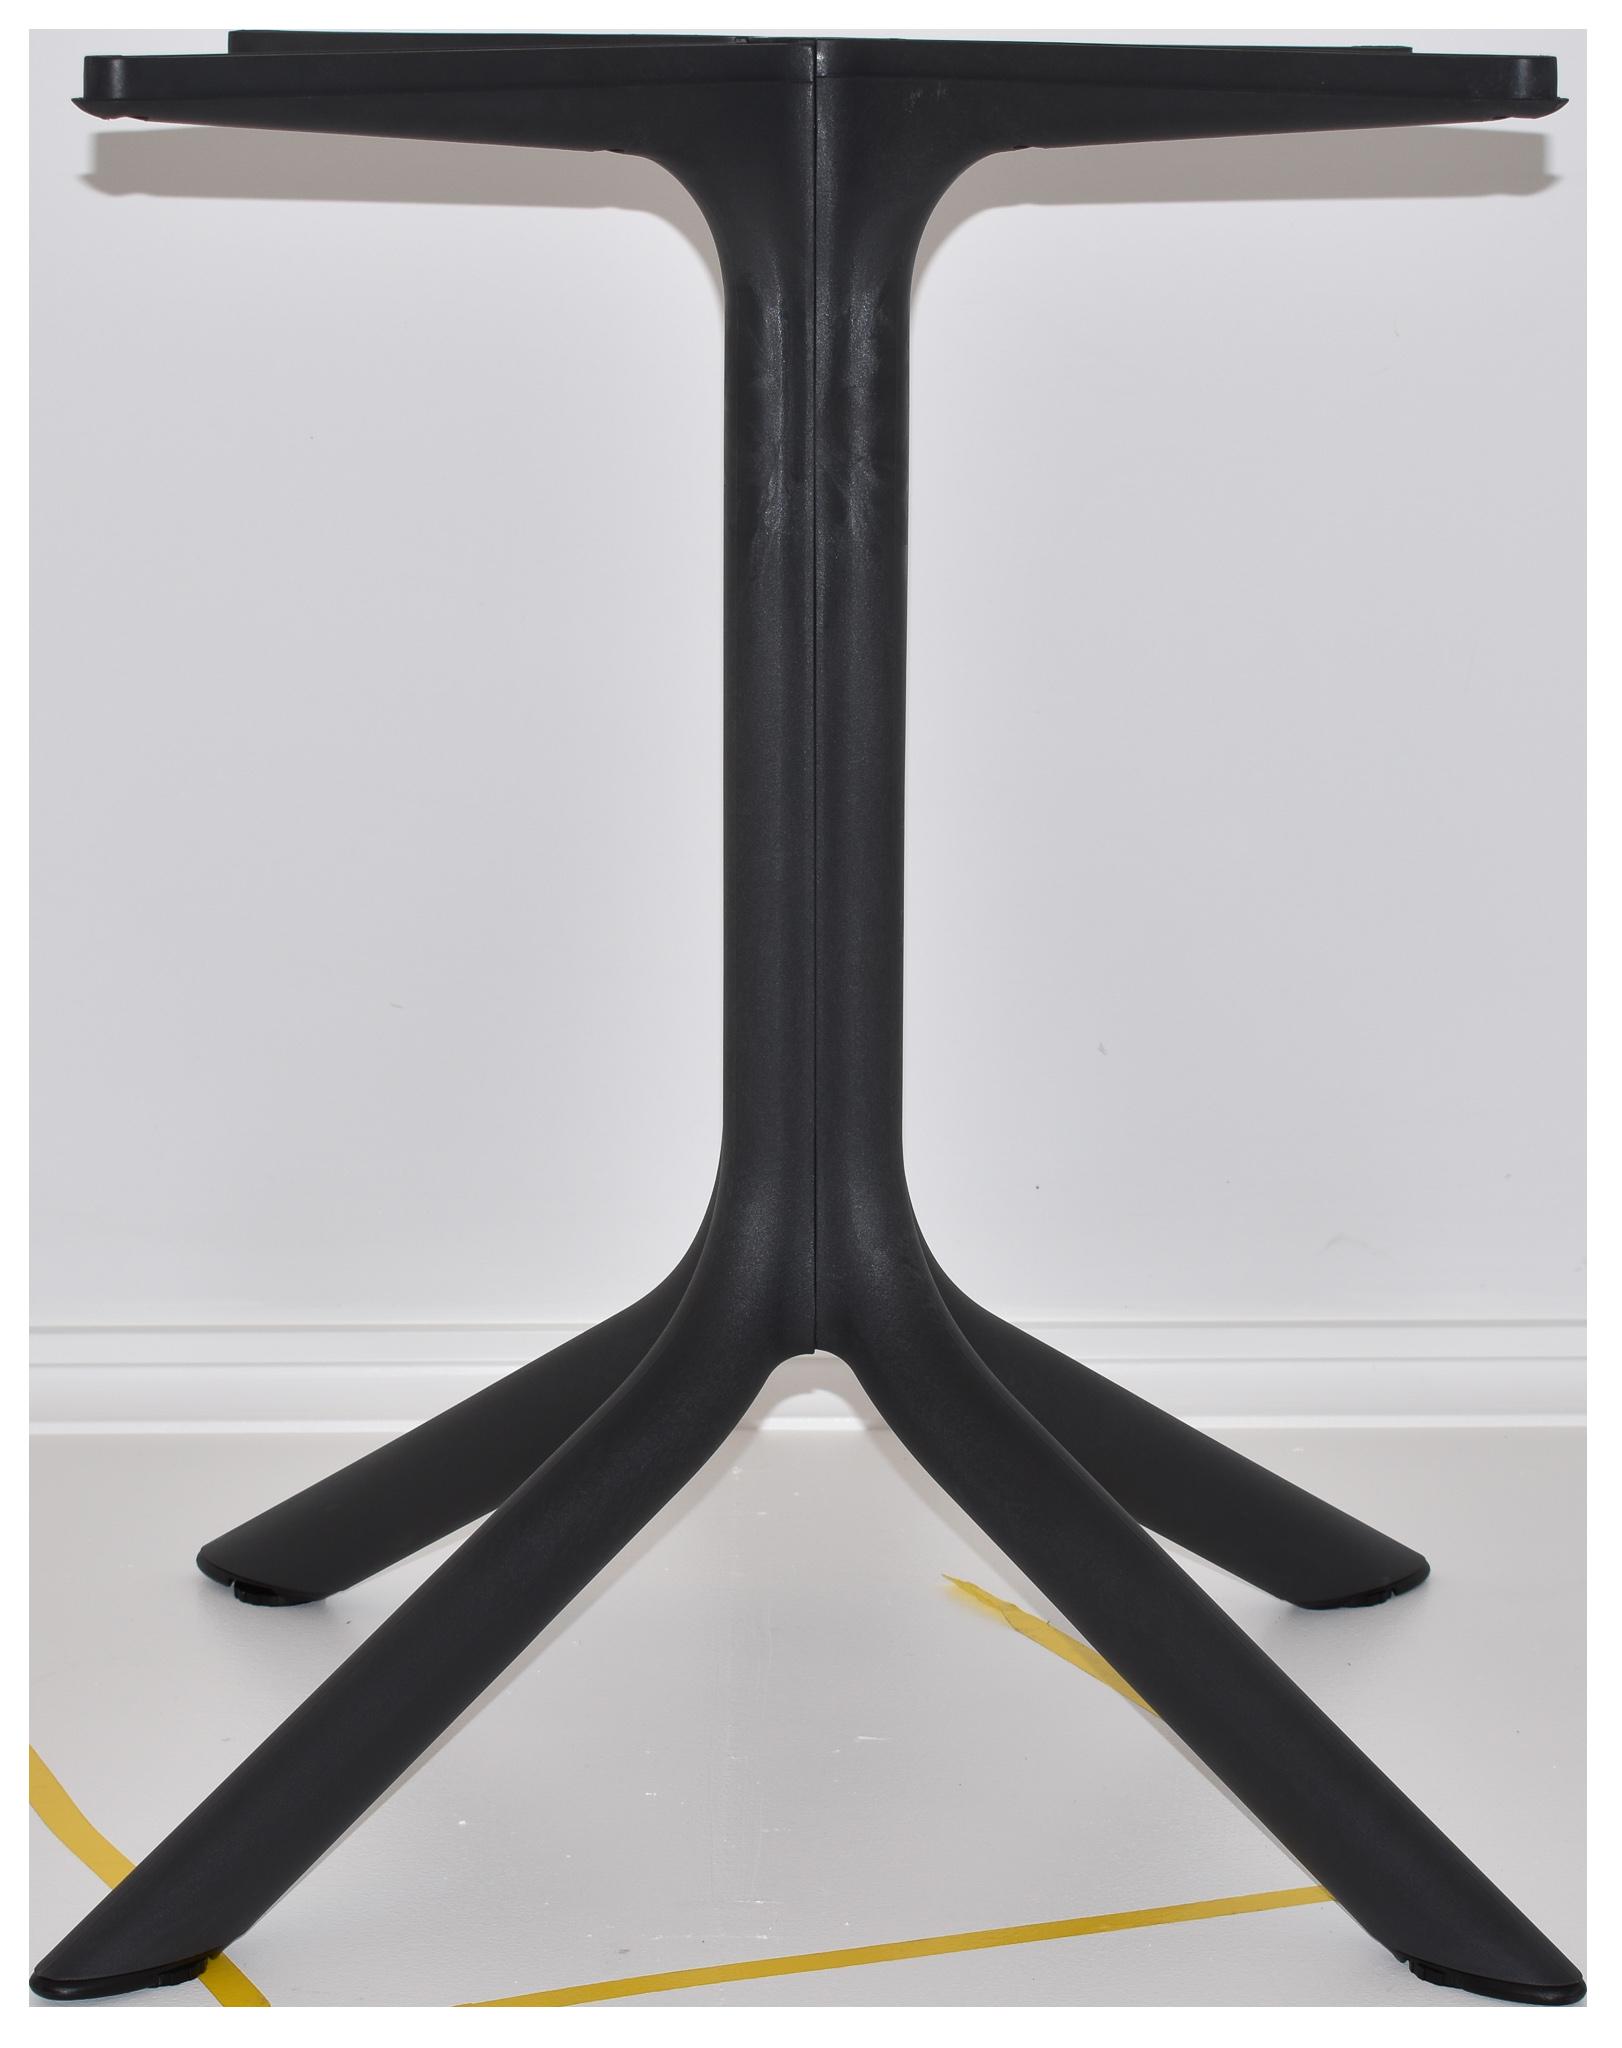 BASE TABLE CLIP